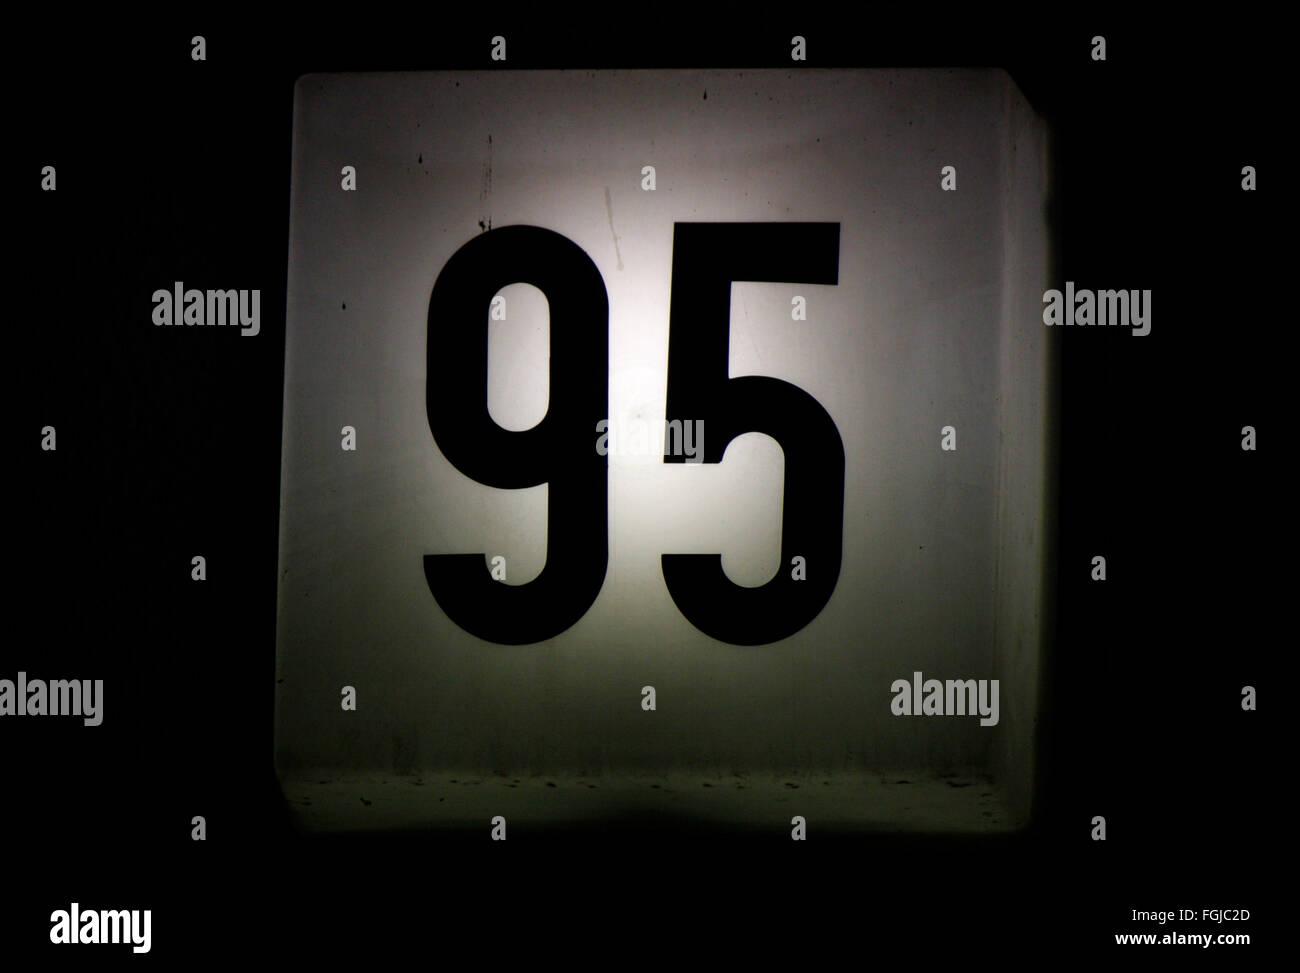 Zahl: '95', Berlin. - Stock Image